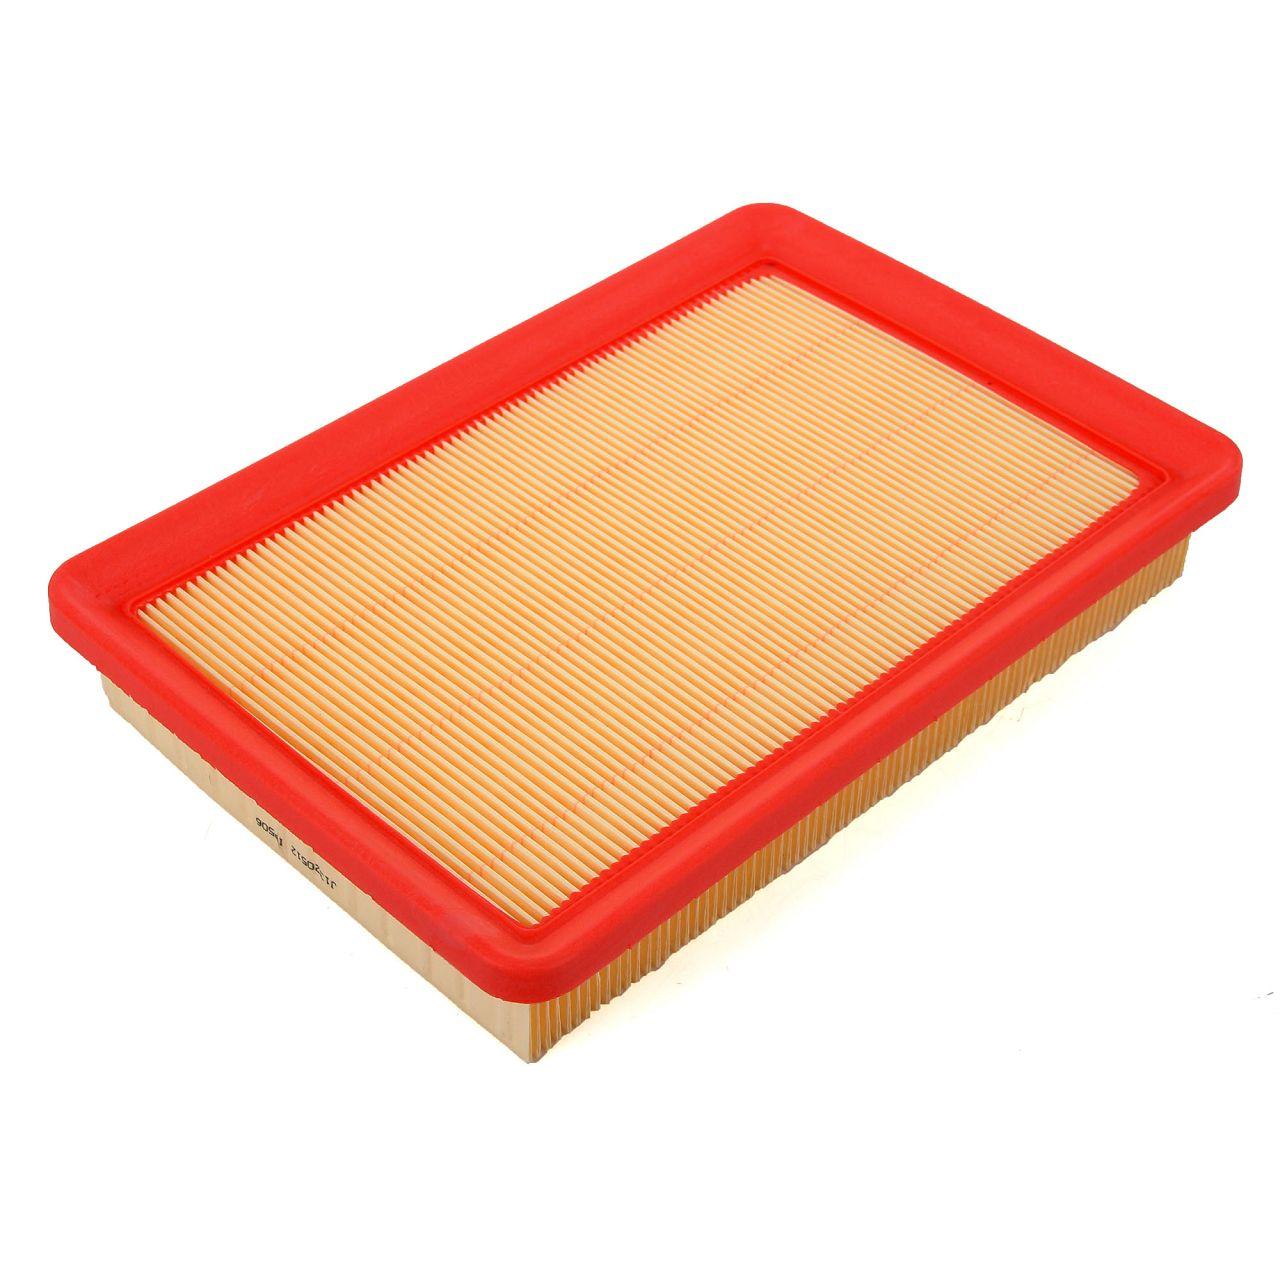 HERTH+BUSS JAKOPARTS Filterpaket Filterset für KIA CERATO (LD) 1.6 2.0 105/143PS